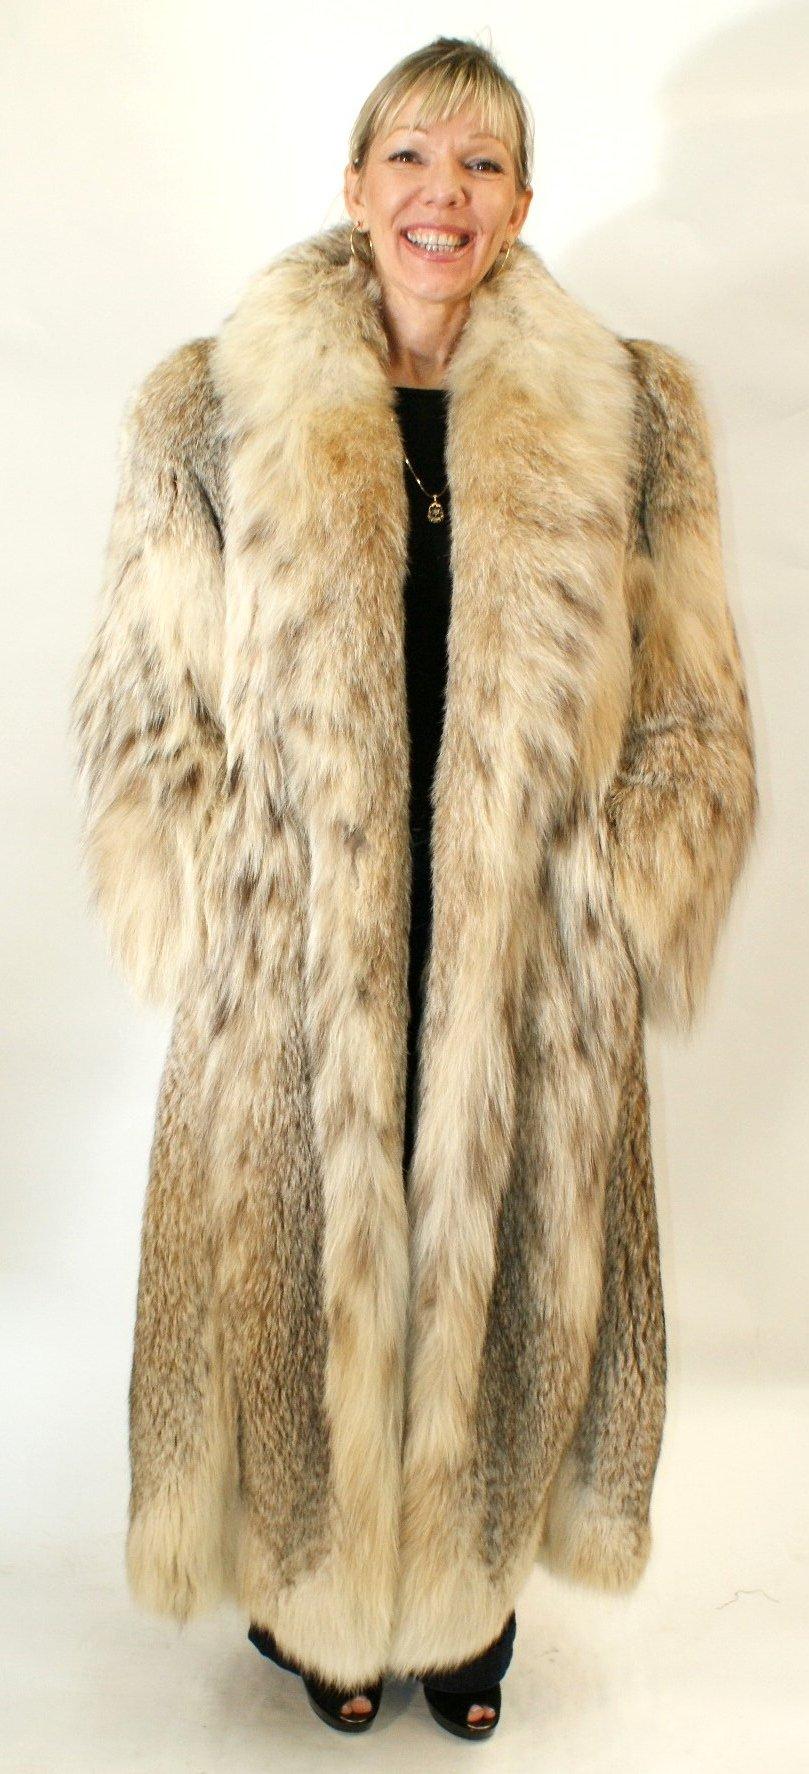 Wolverine Furs Furs Luxury Outerwear Amp Accessories Fur